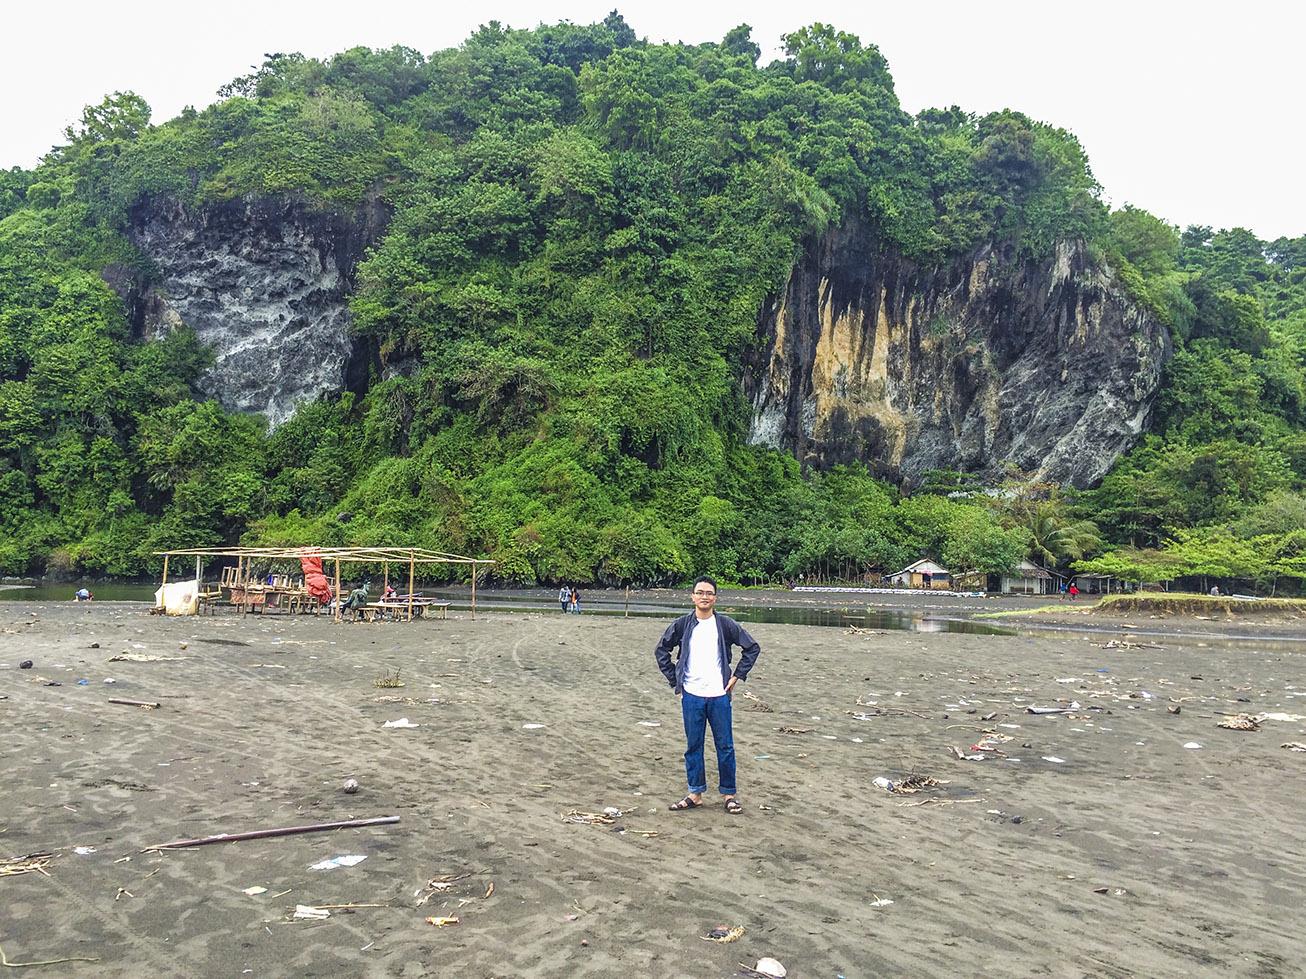 wisata ke pantai sodong